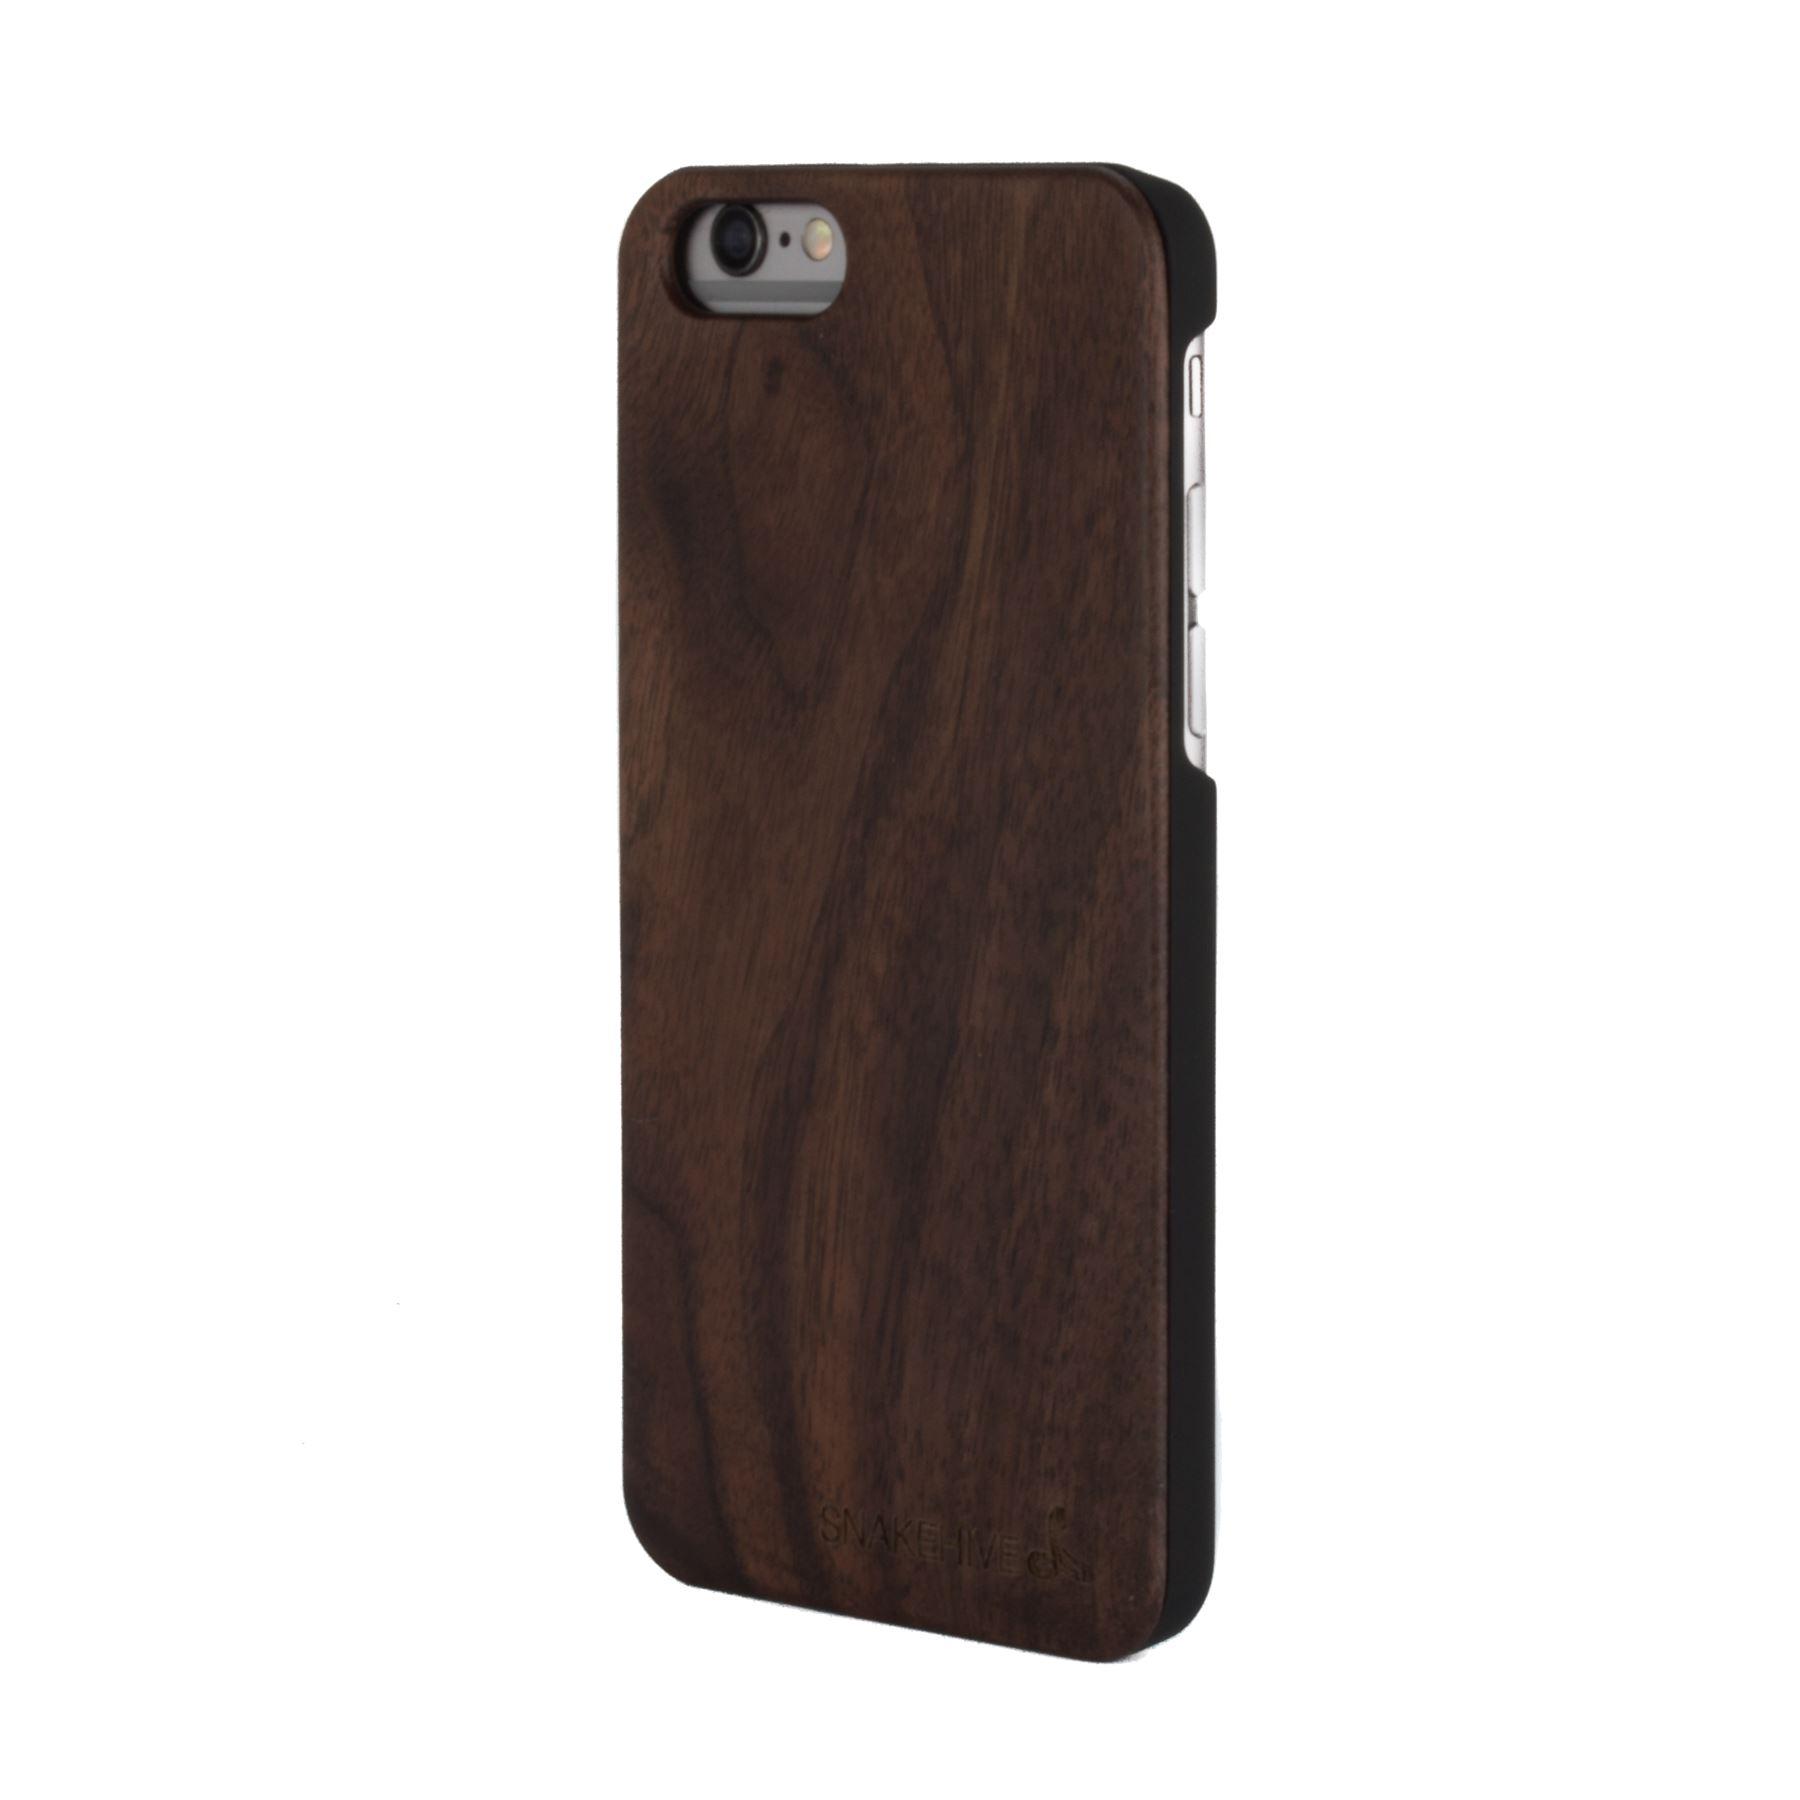 Wooden Iphone  Case Uk